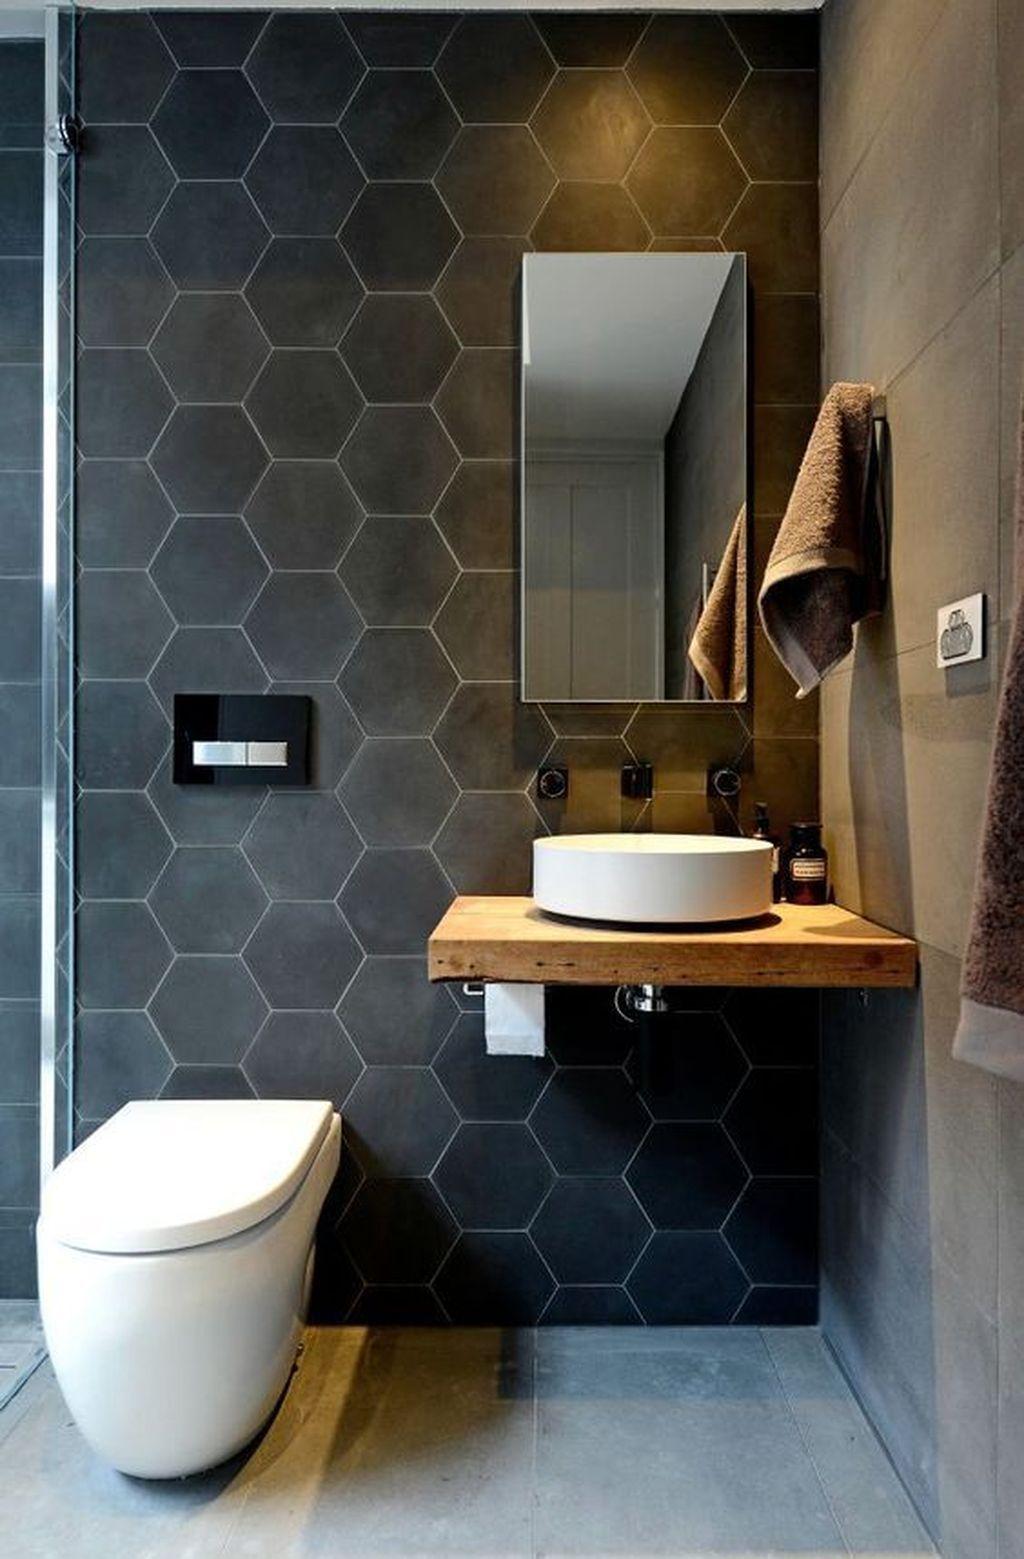 38 Cozy Small Office Bathroom Designs Ideas Decor Modern Remodel